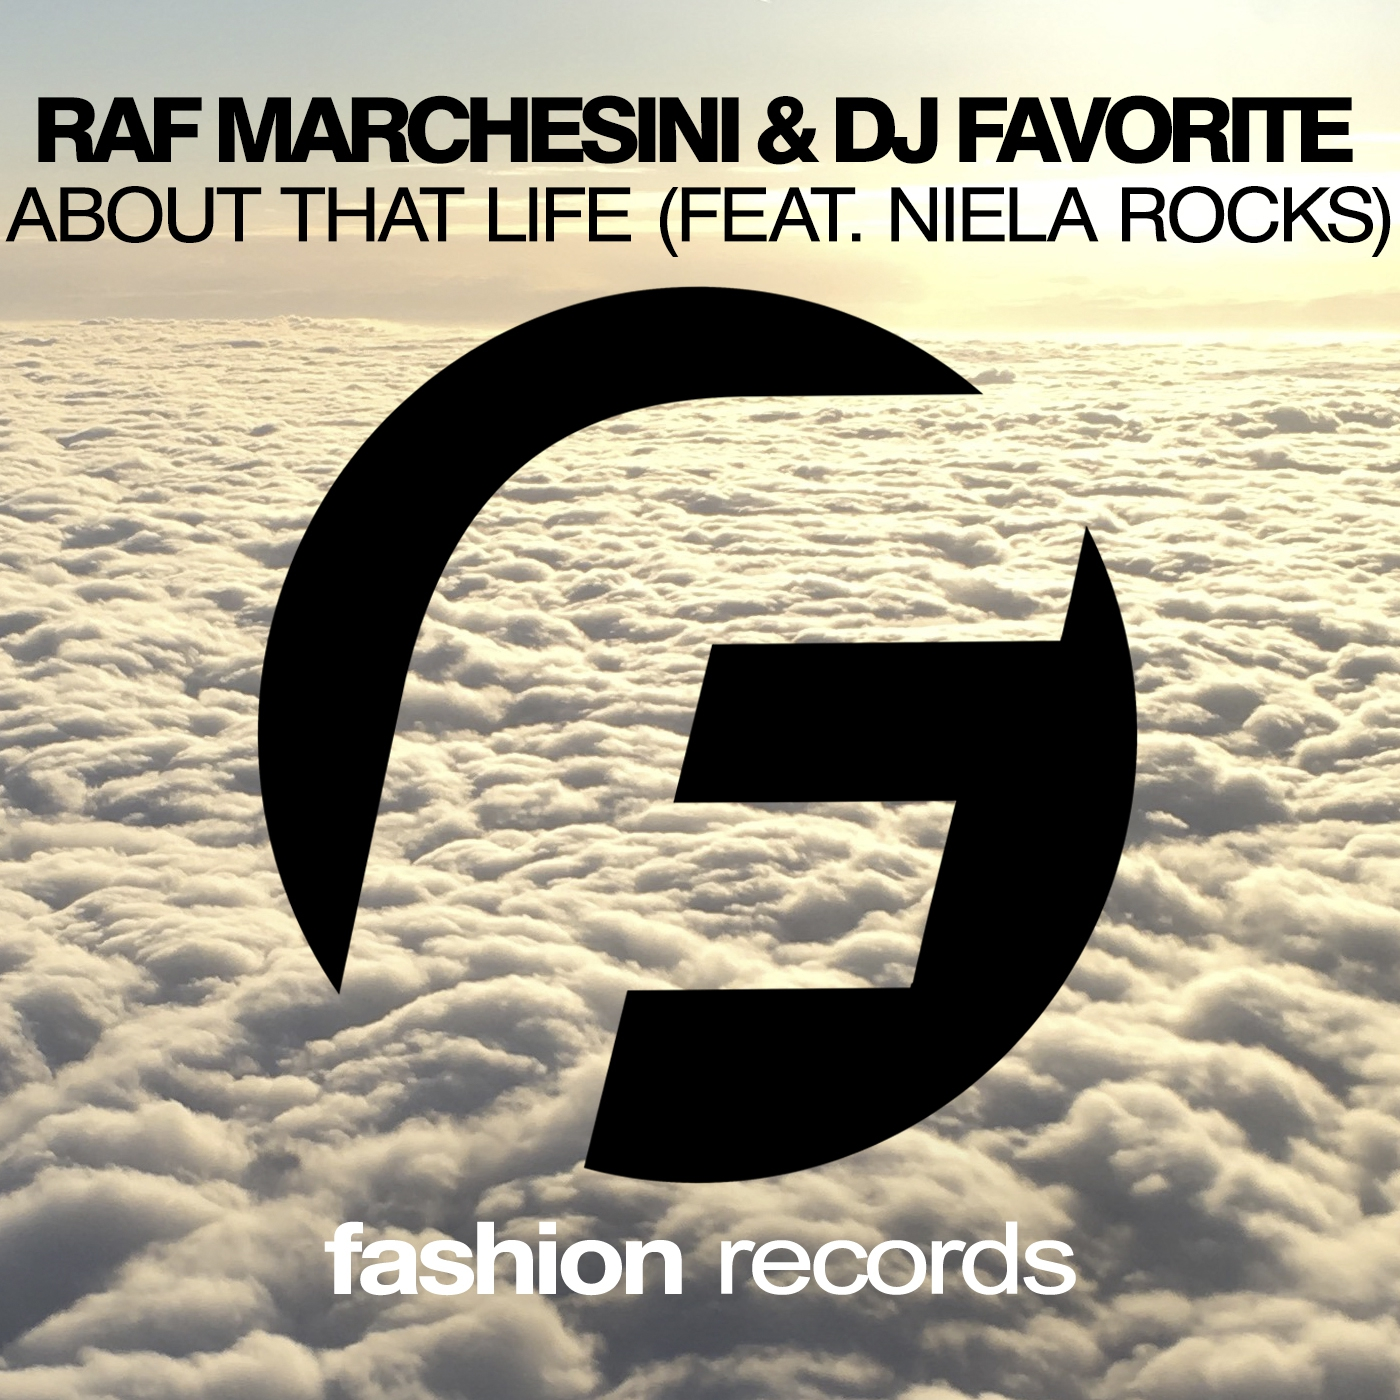 Raf Marchesini & DJ Favorite & Niela Rocks - About That Life (Original Mix)